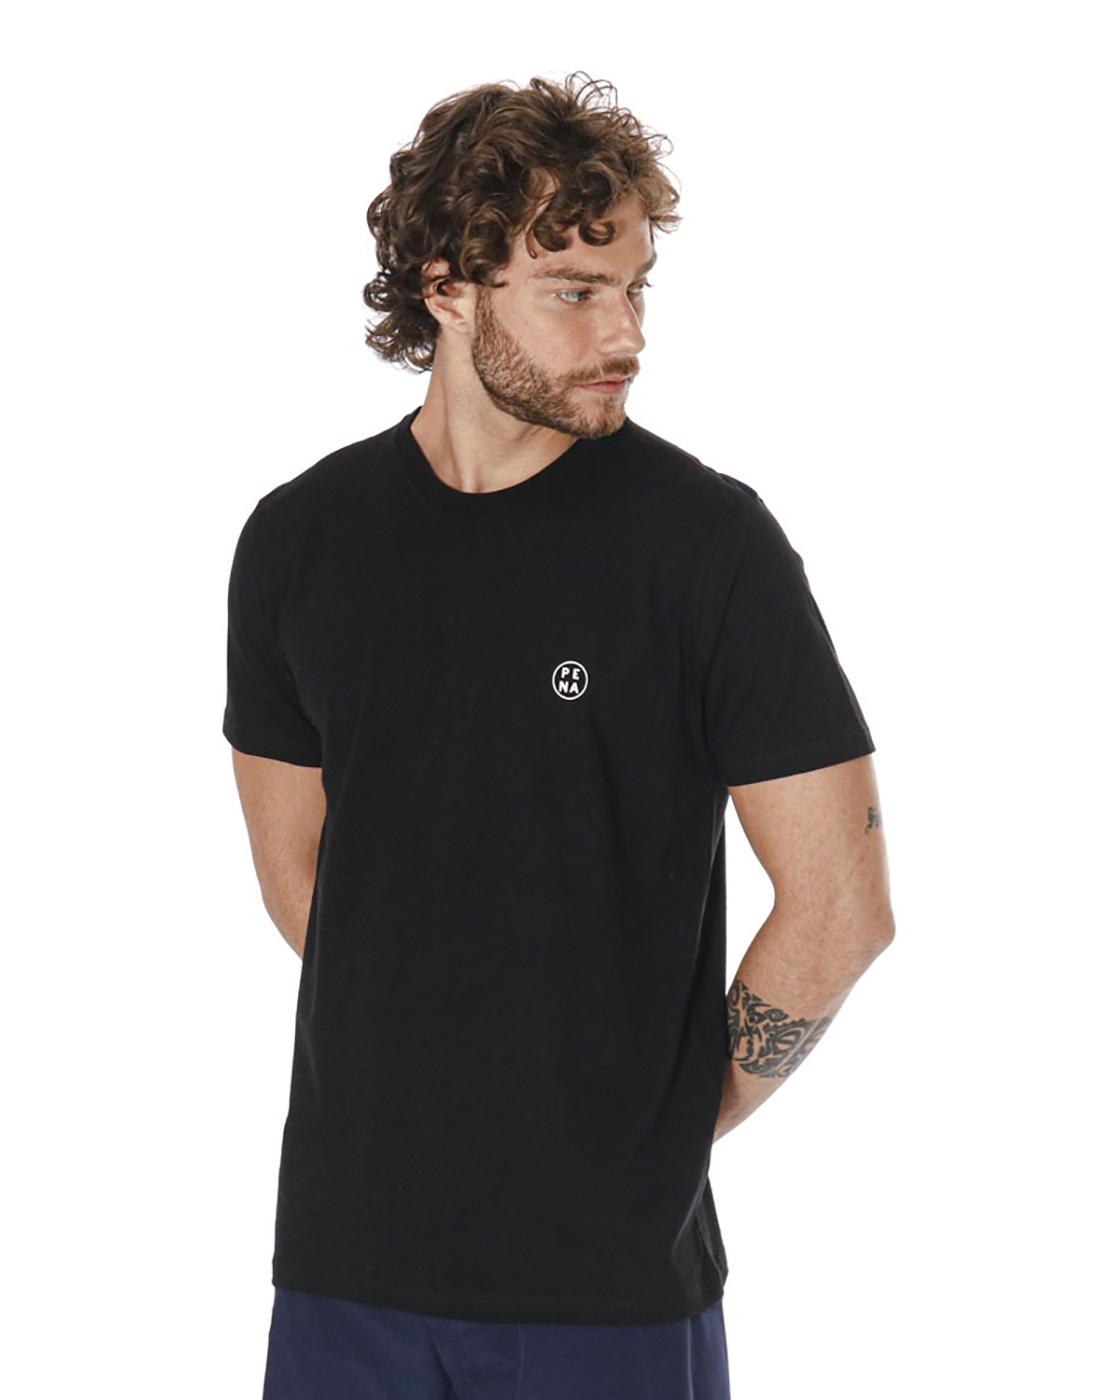 Camiseta Estampada Lion Of Judah Preto Pena